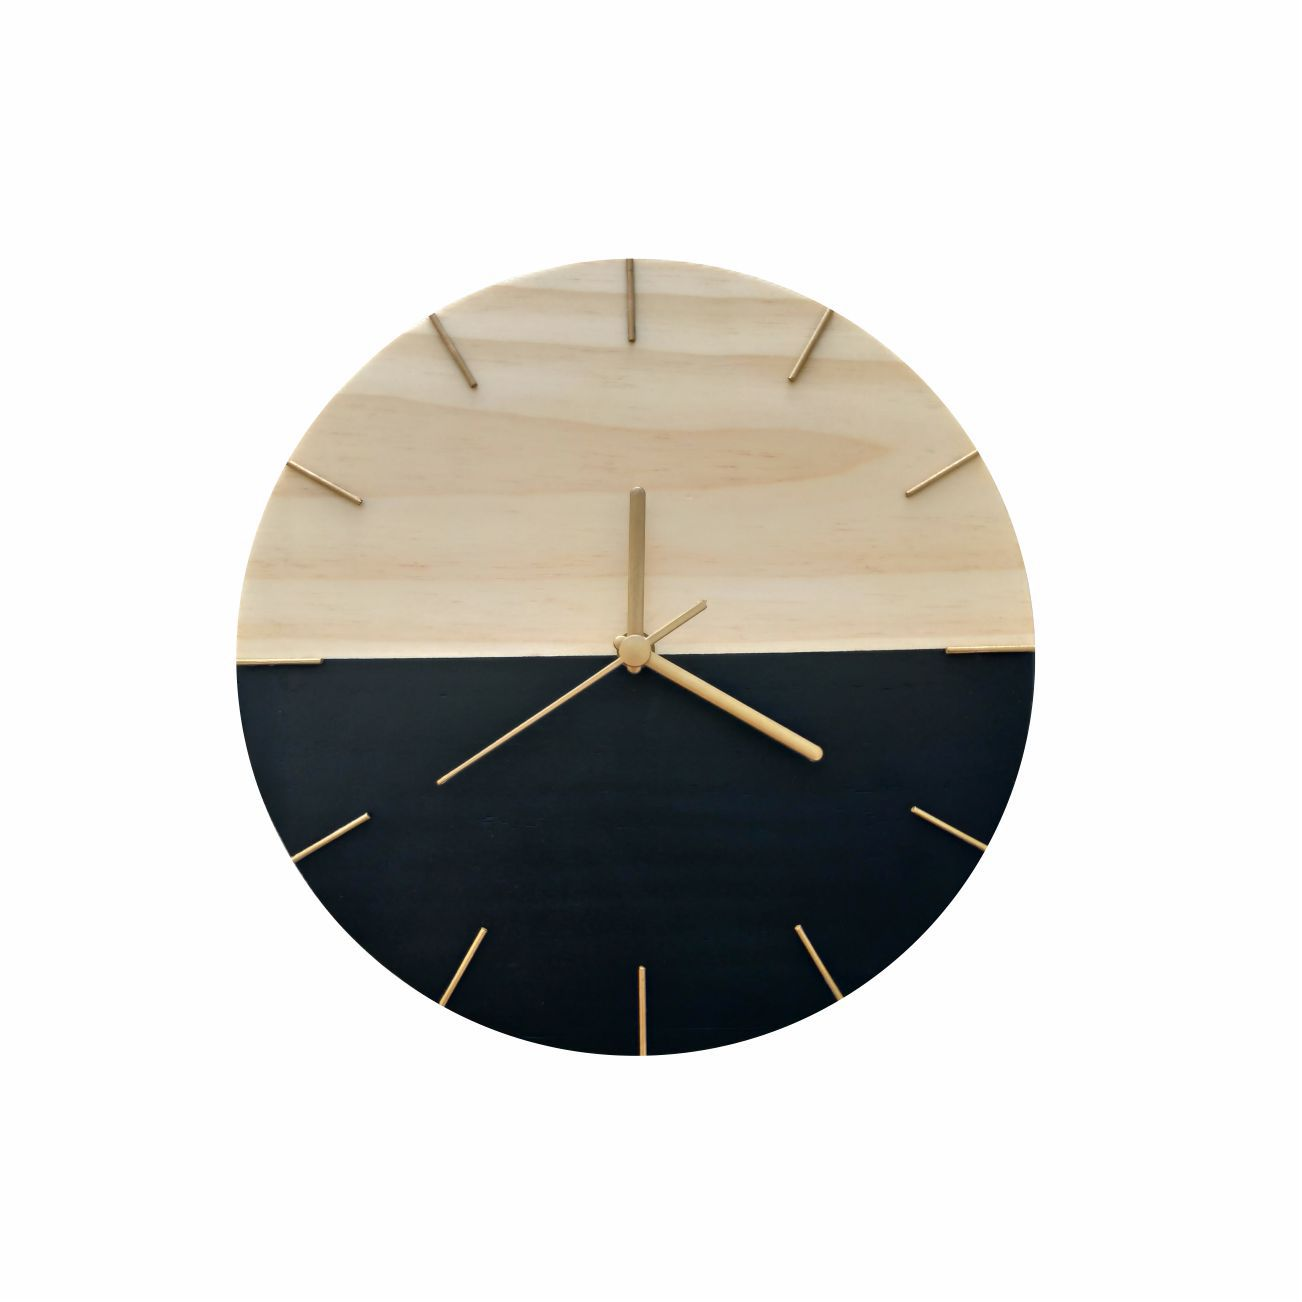 Relógio Minimalista Preto e Dourado